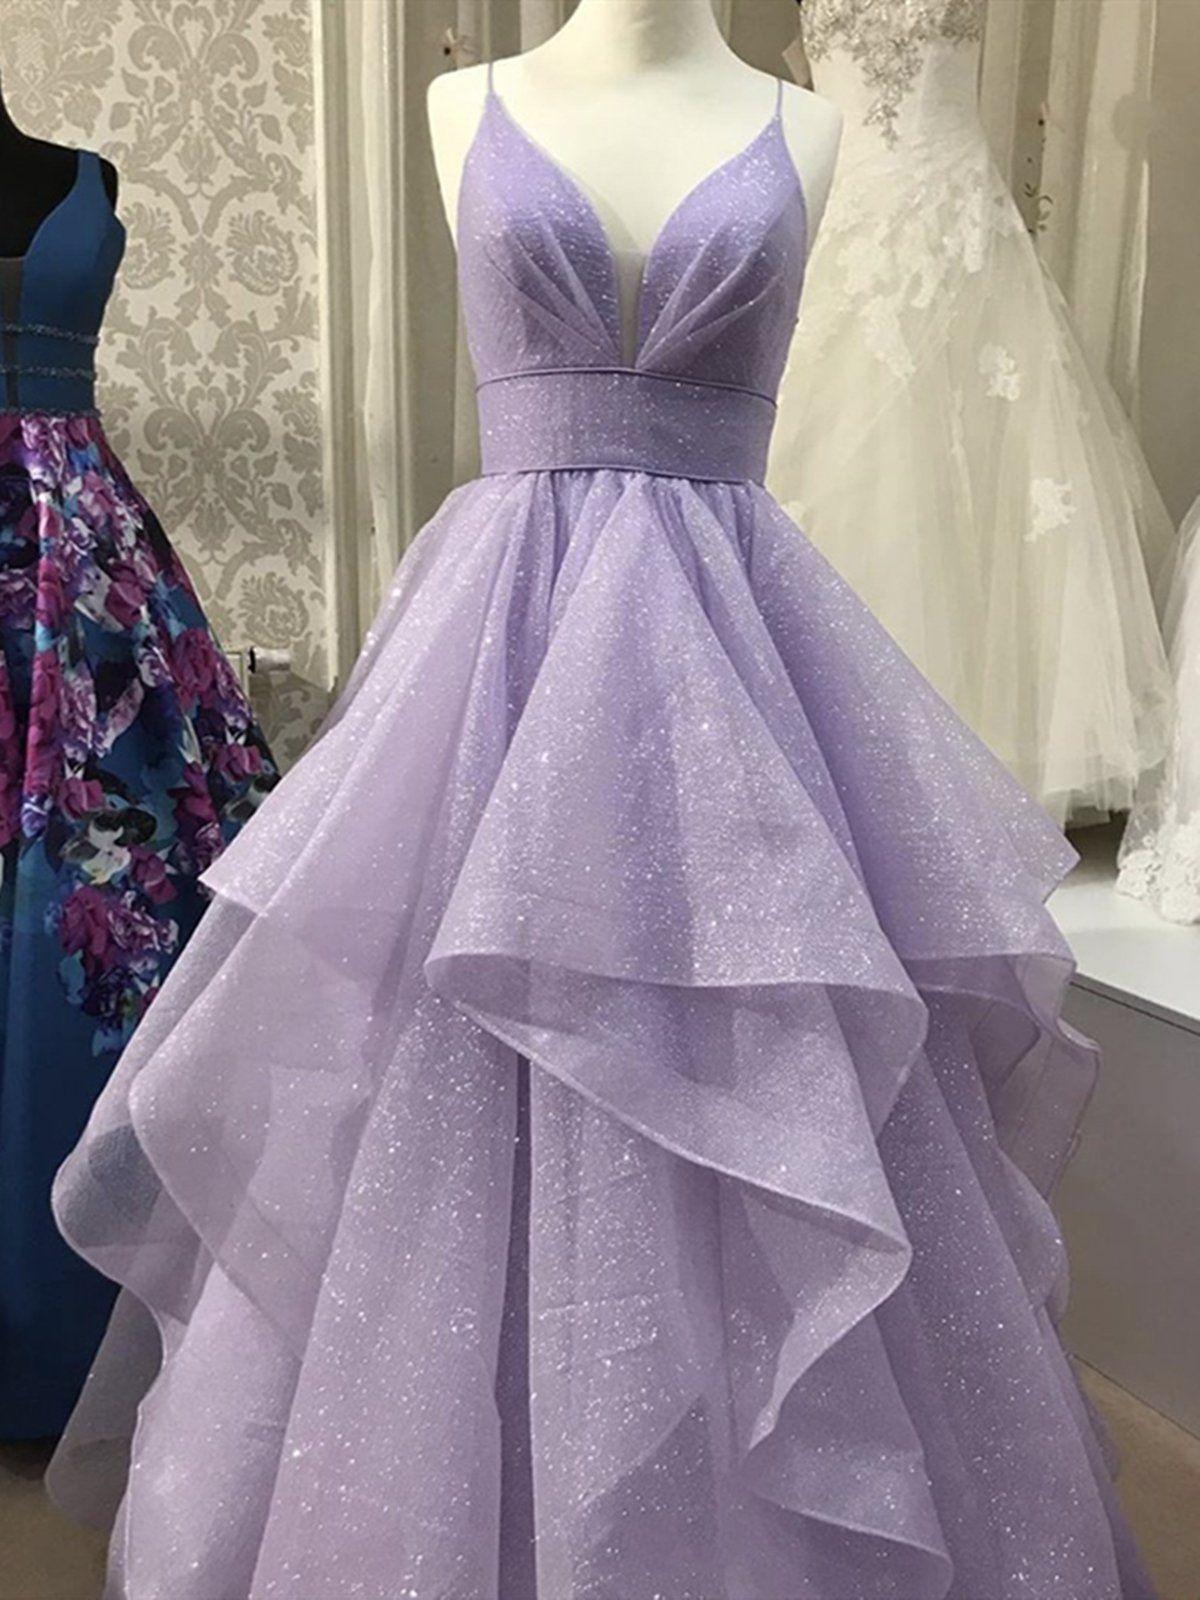 Shiny V Neck Purple Prom Dresses Shiny V Neck Purple Formal Graduation Evening Dresses In 2021 Trendy Prom Dresses Purple Prom Dress Cute Prom Dresses [ 1600 x 1200 Pixel ]